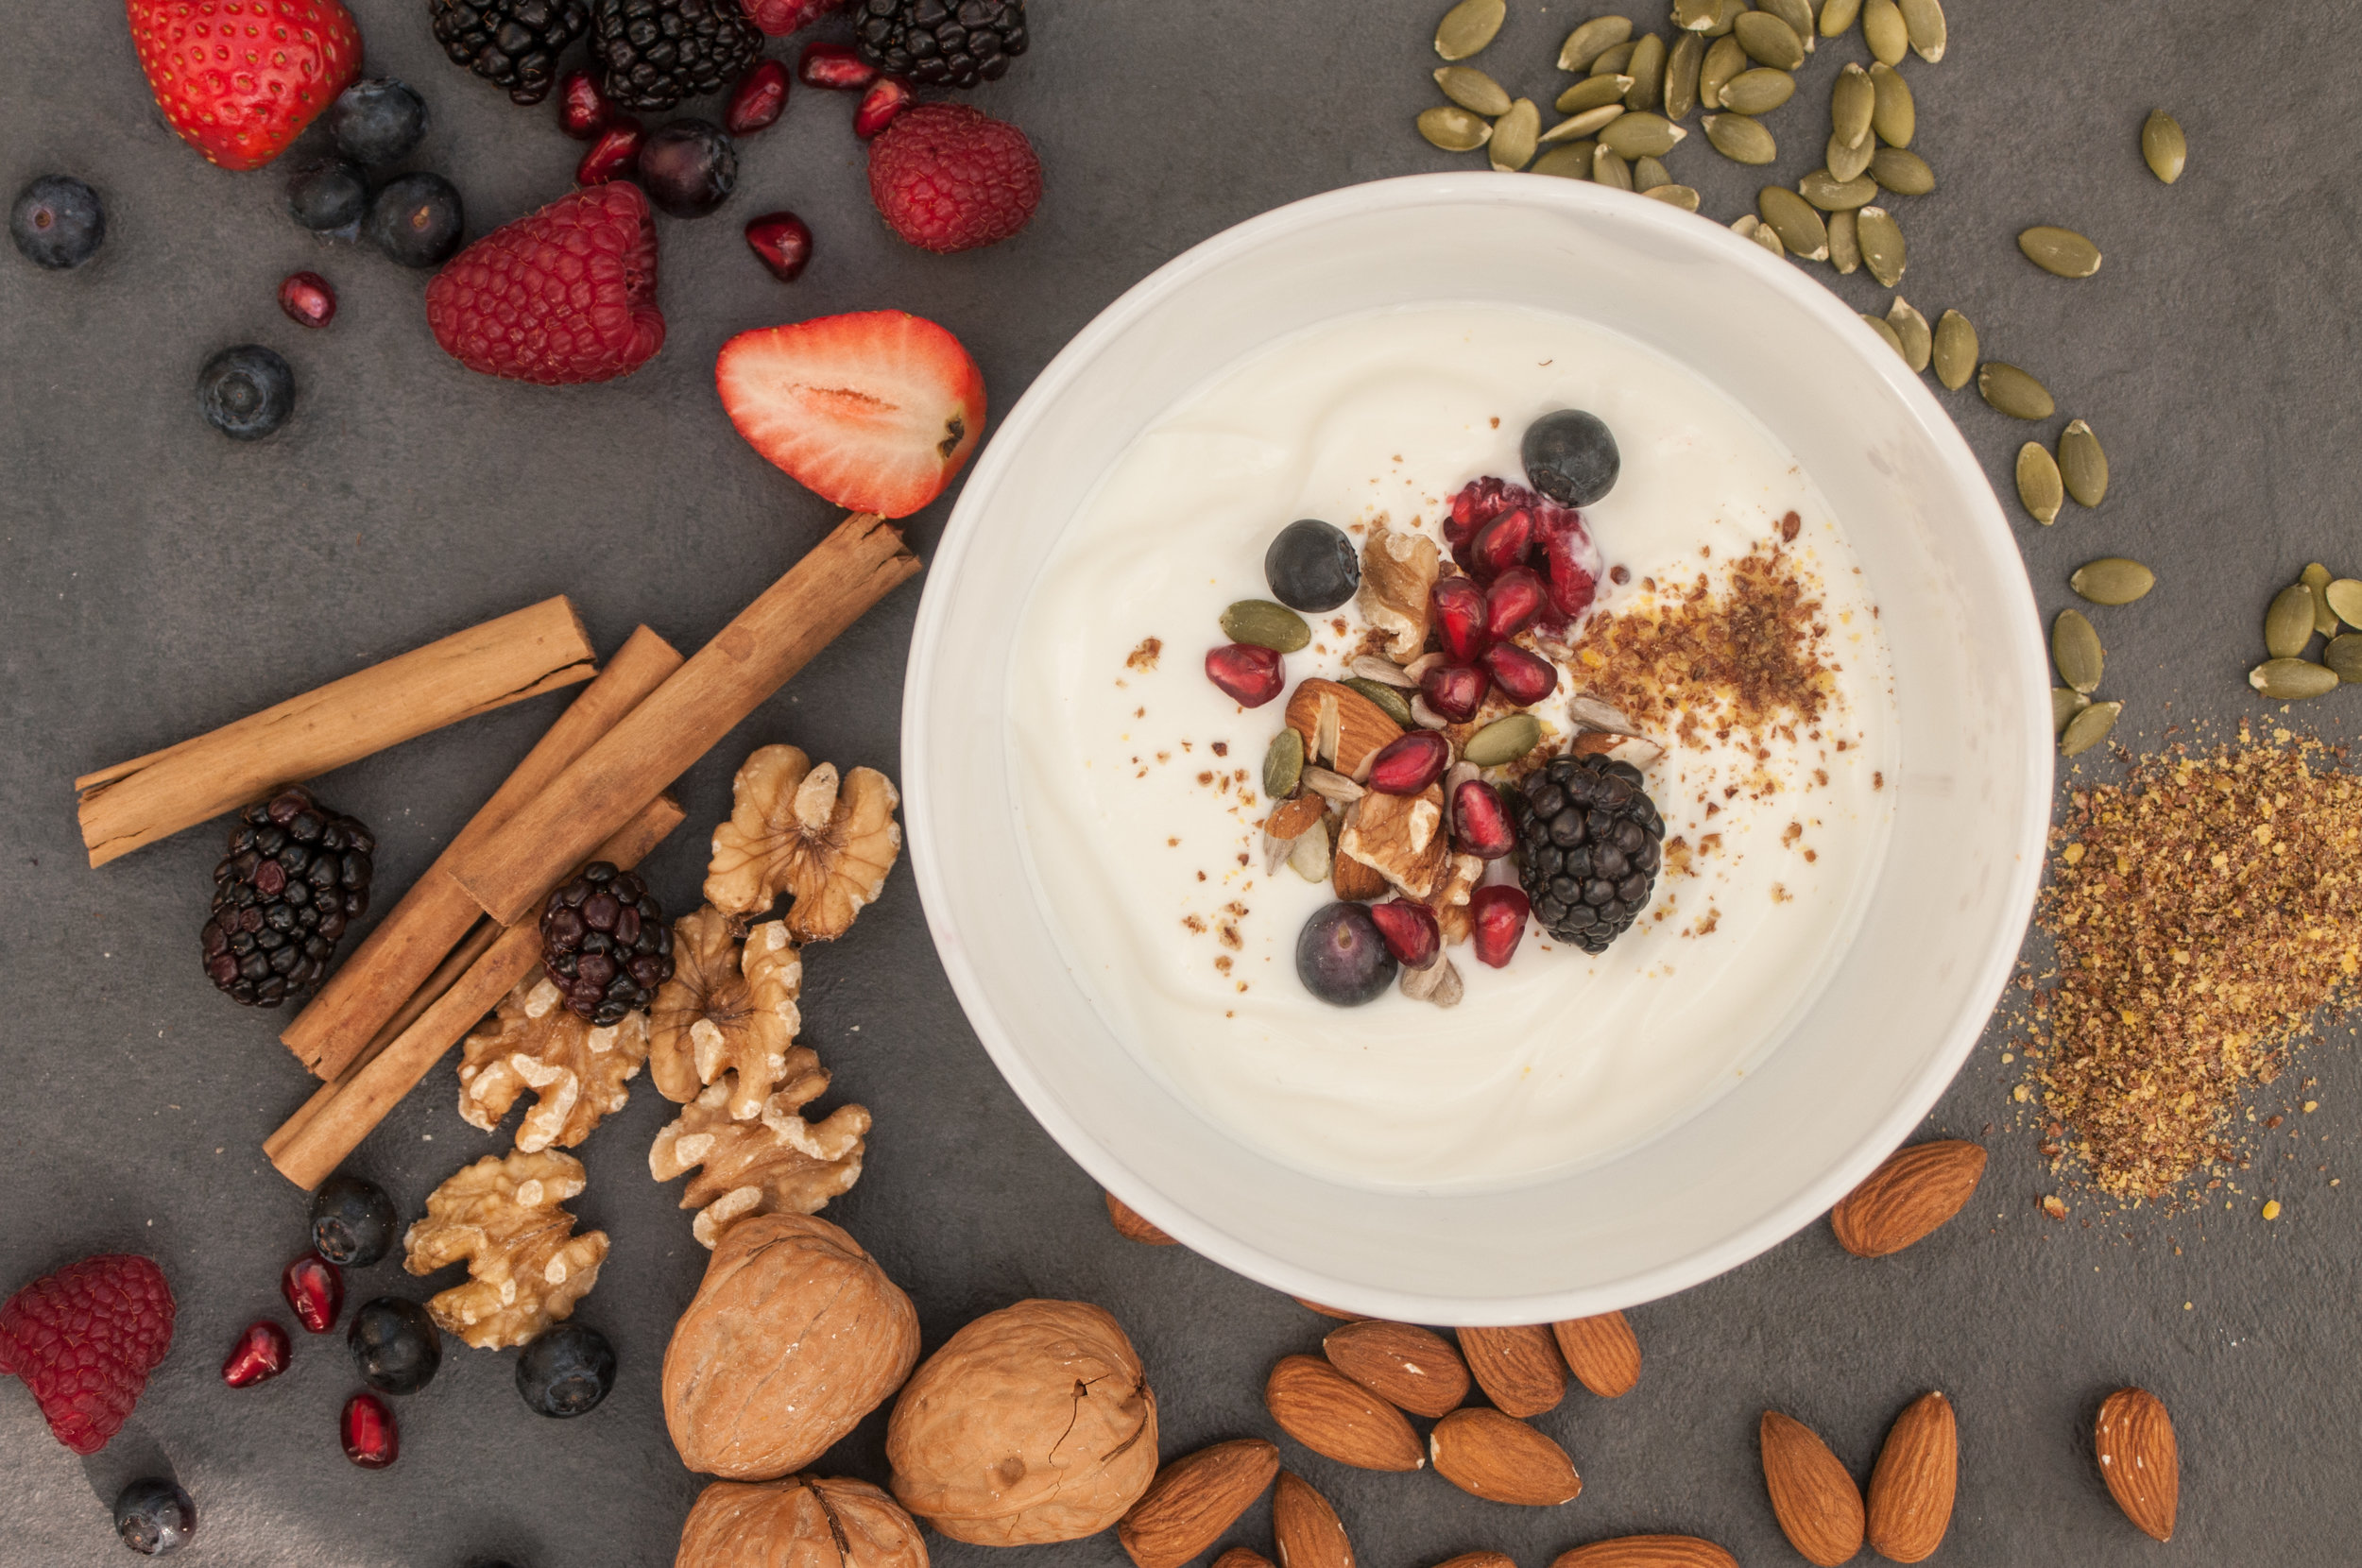 Probiotic yoghurt with polyphenol rich berries, linseeds, walnuts and cinnamon